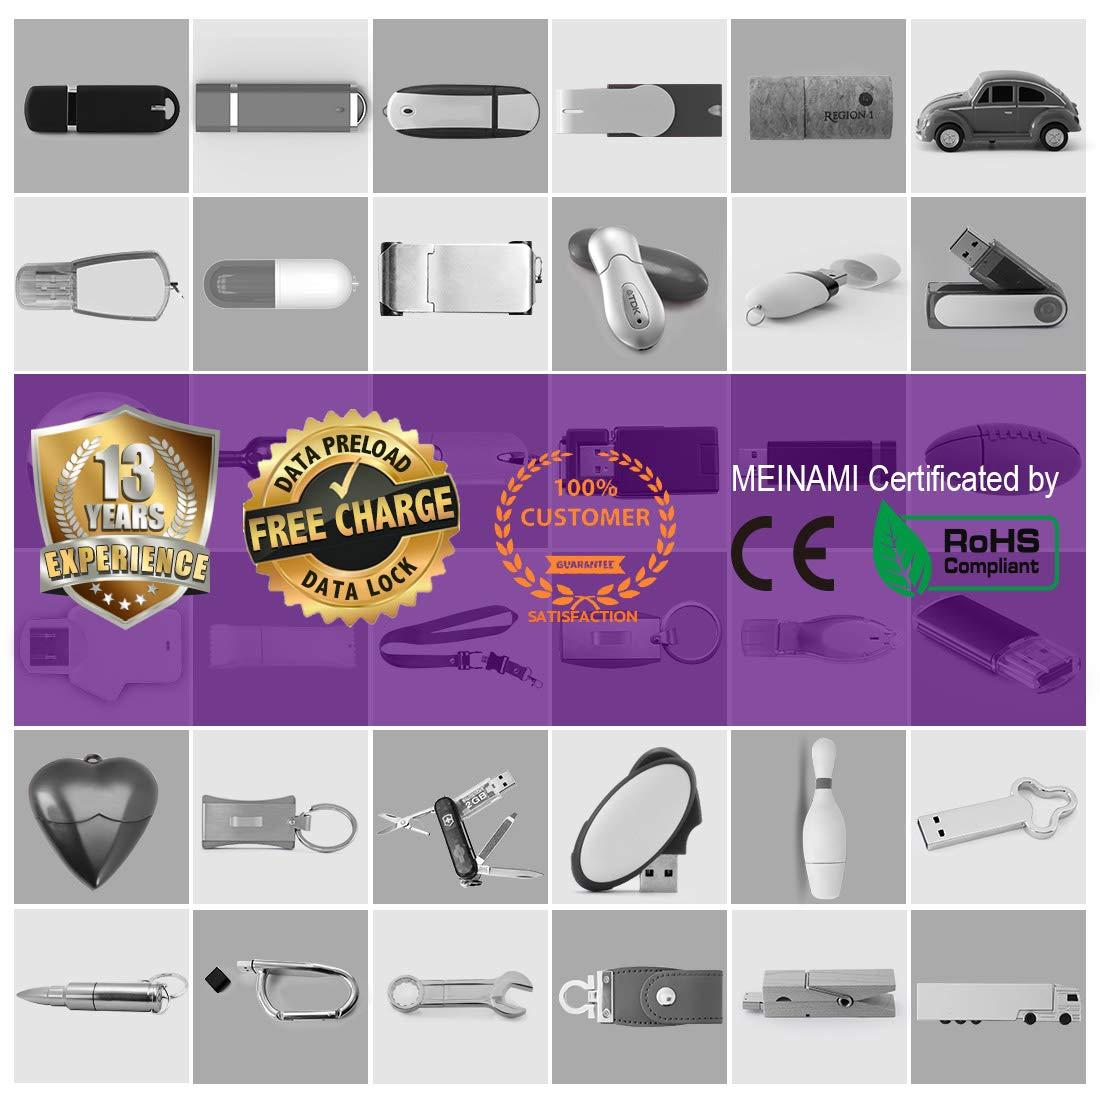 100 Pack 4GB USB Flash Drive Custom USB Thumb Drive Promotional Memory Stick Personalized Logo Jump Drive Twister Swivel Design in Bulk - PMS by MEINAMI (Image #9)